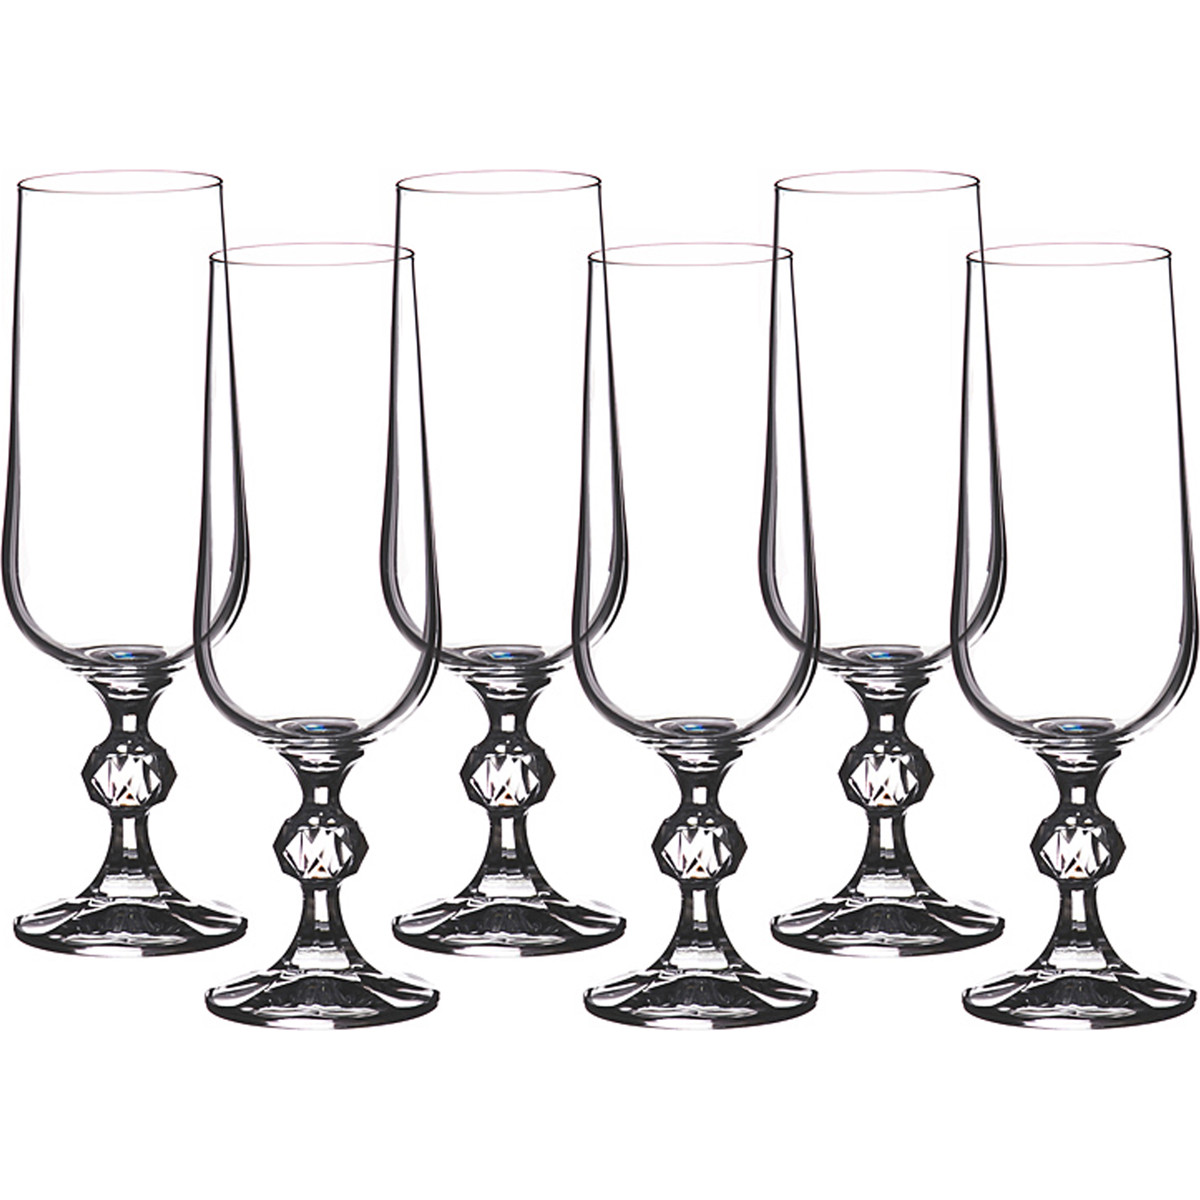 {} Crystalite Bohemia Набор бокалов для шампанского Moyna  (17 см - 6 шт)